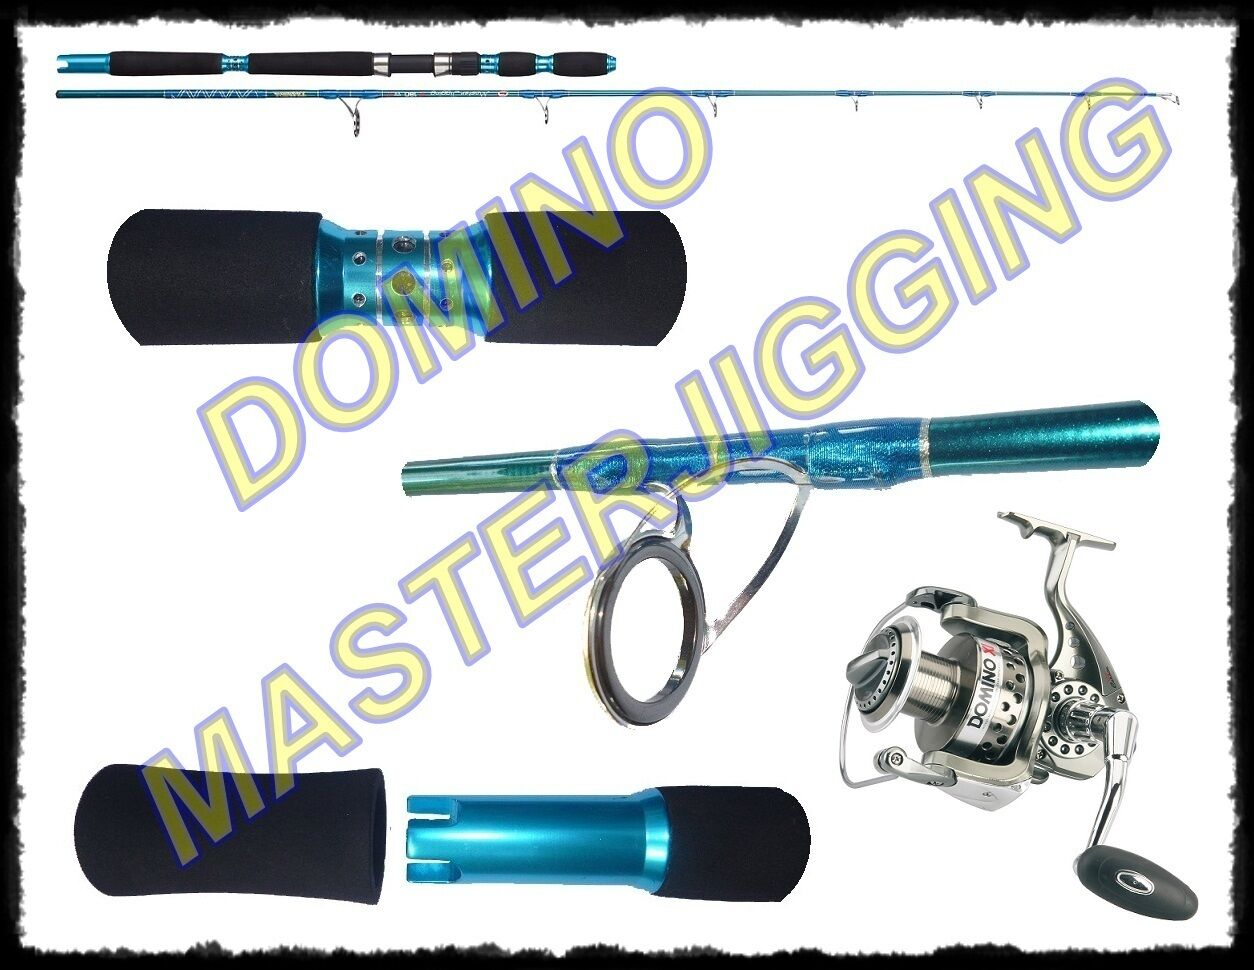 KIT CANNA MASTER JIGGING JIGGING JIGGING + MULINELLO DOMINO 5000 VERTICAL LIGHT 20/60lb CARBONIO a4c46a